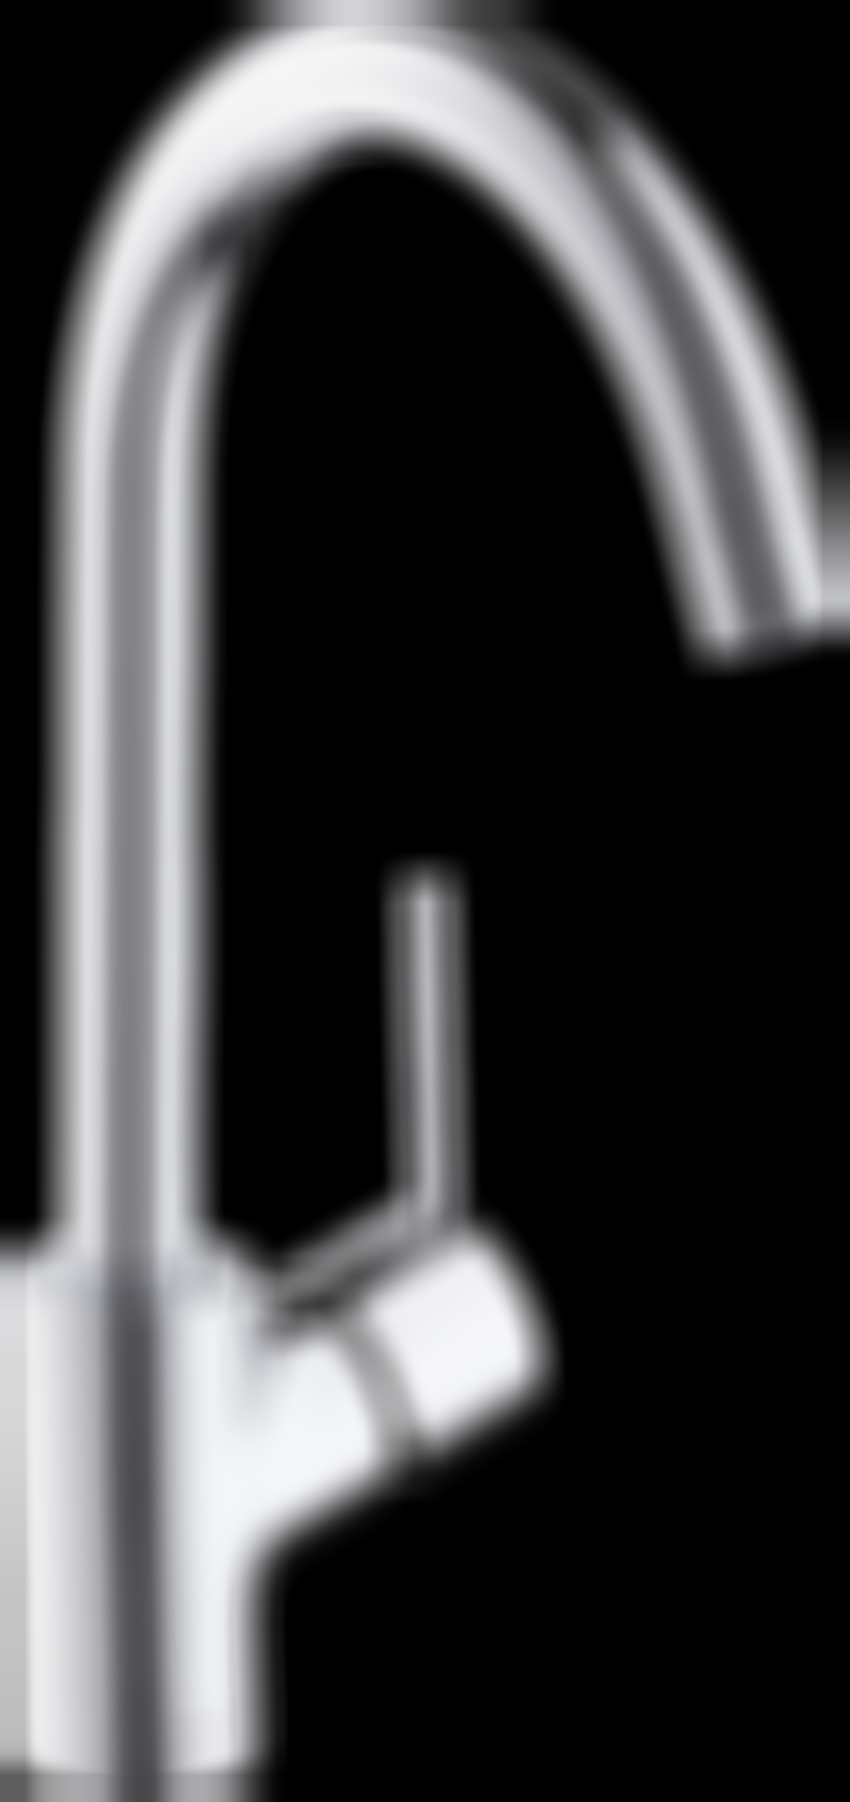 Jednouchwytowa bateria kuchenna 270 1jet Hansgrohe Talis M52